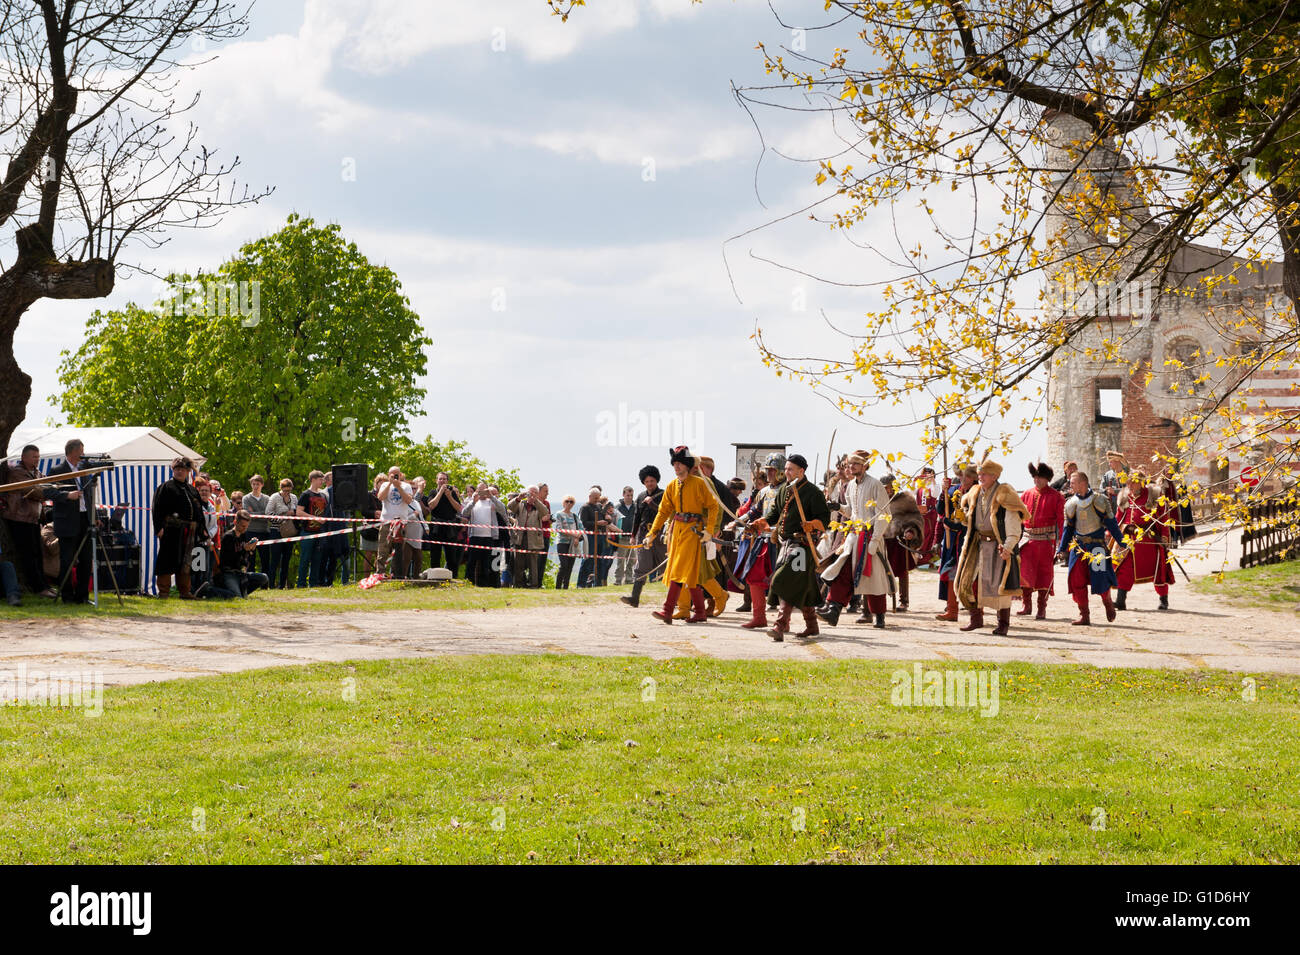 Swedes assault on the Janowiec Castle event of historical battle reenactment at Majowka z Kmicicem show, Swedish - Stock Image